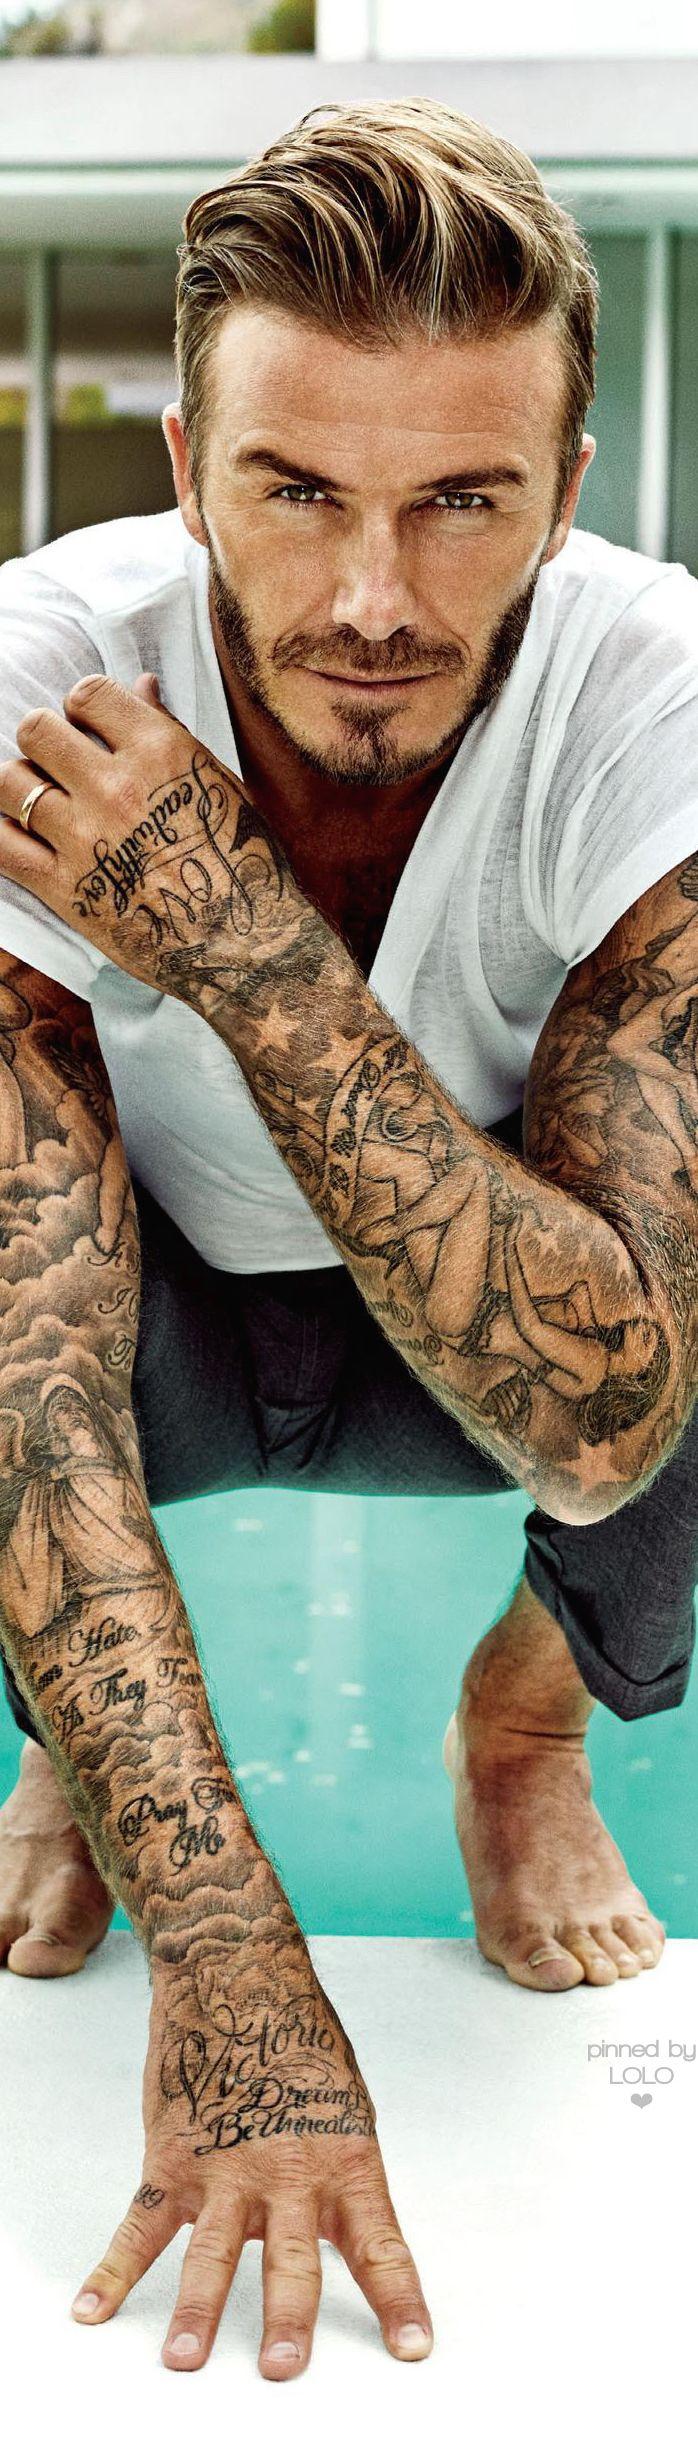 8b1e5045f6b04 David Beckham People Sexiest Man Alive by Marc Hom | LOLO ...